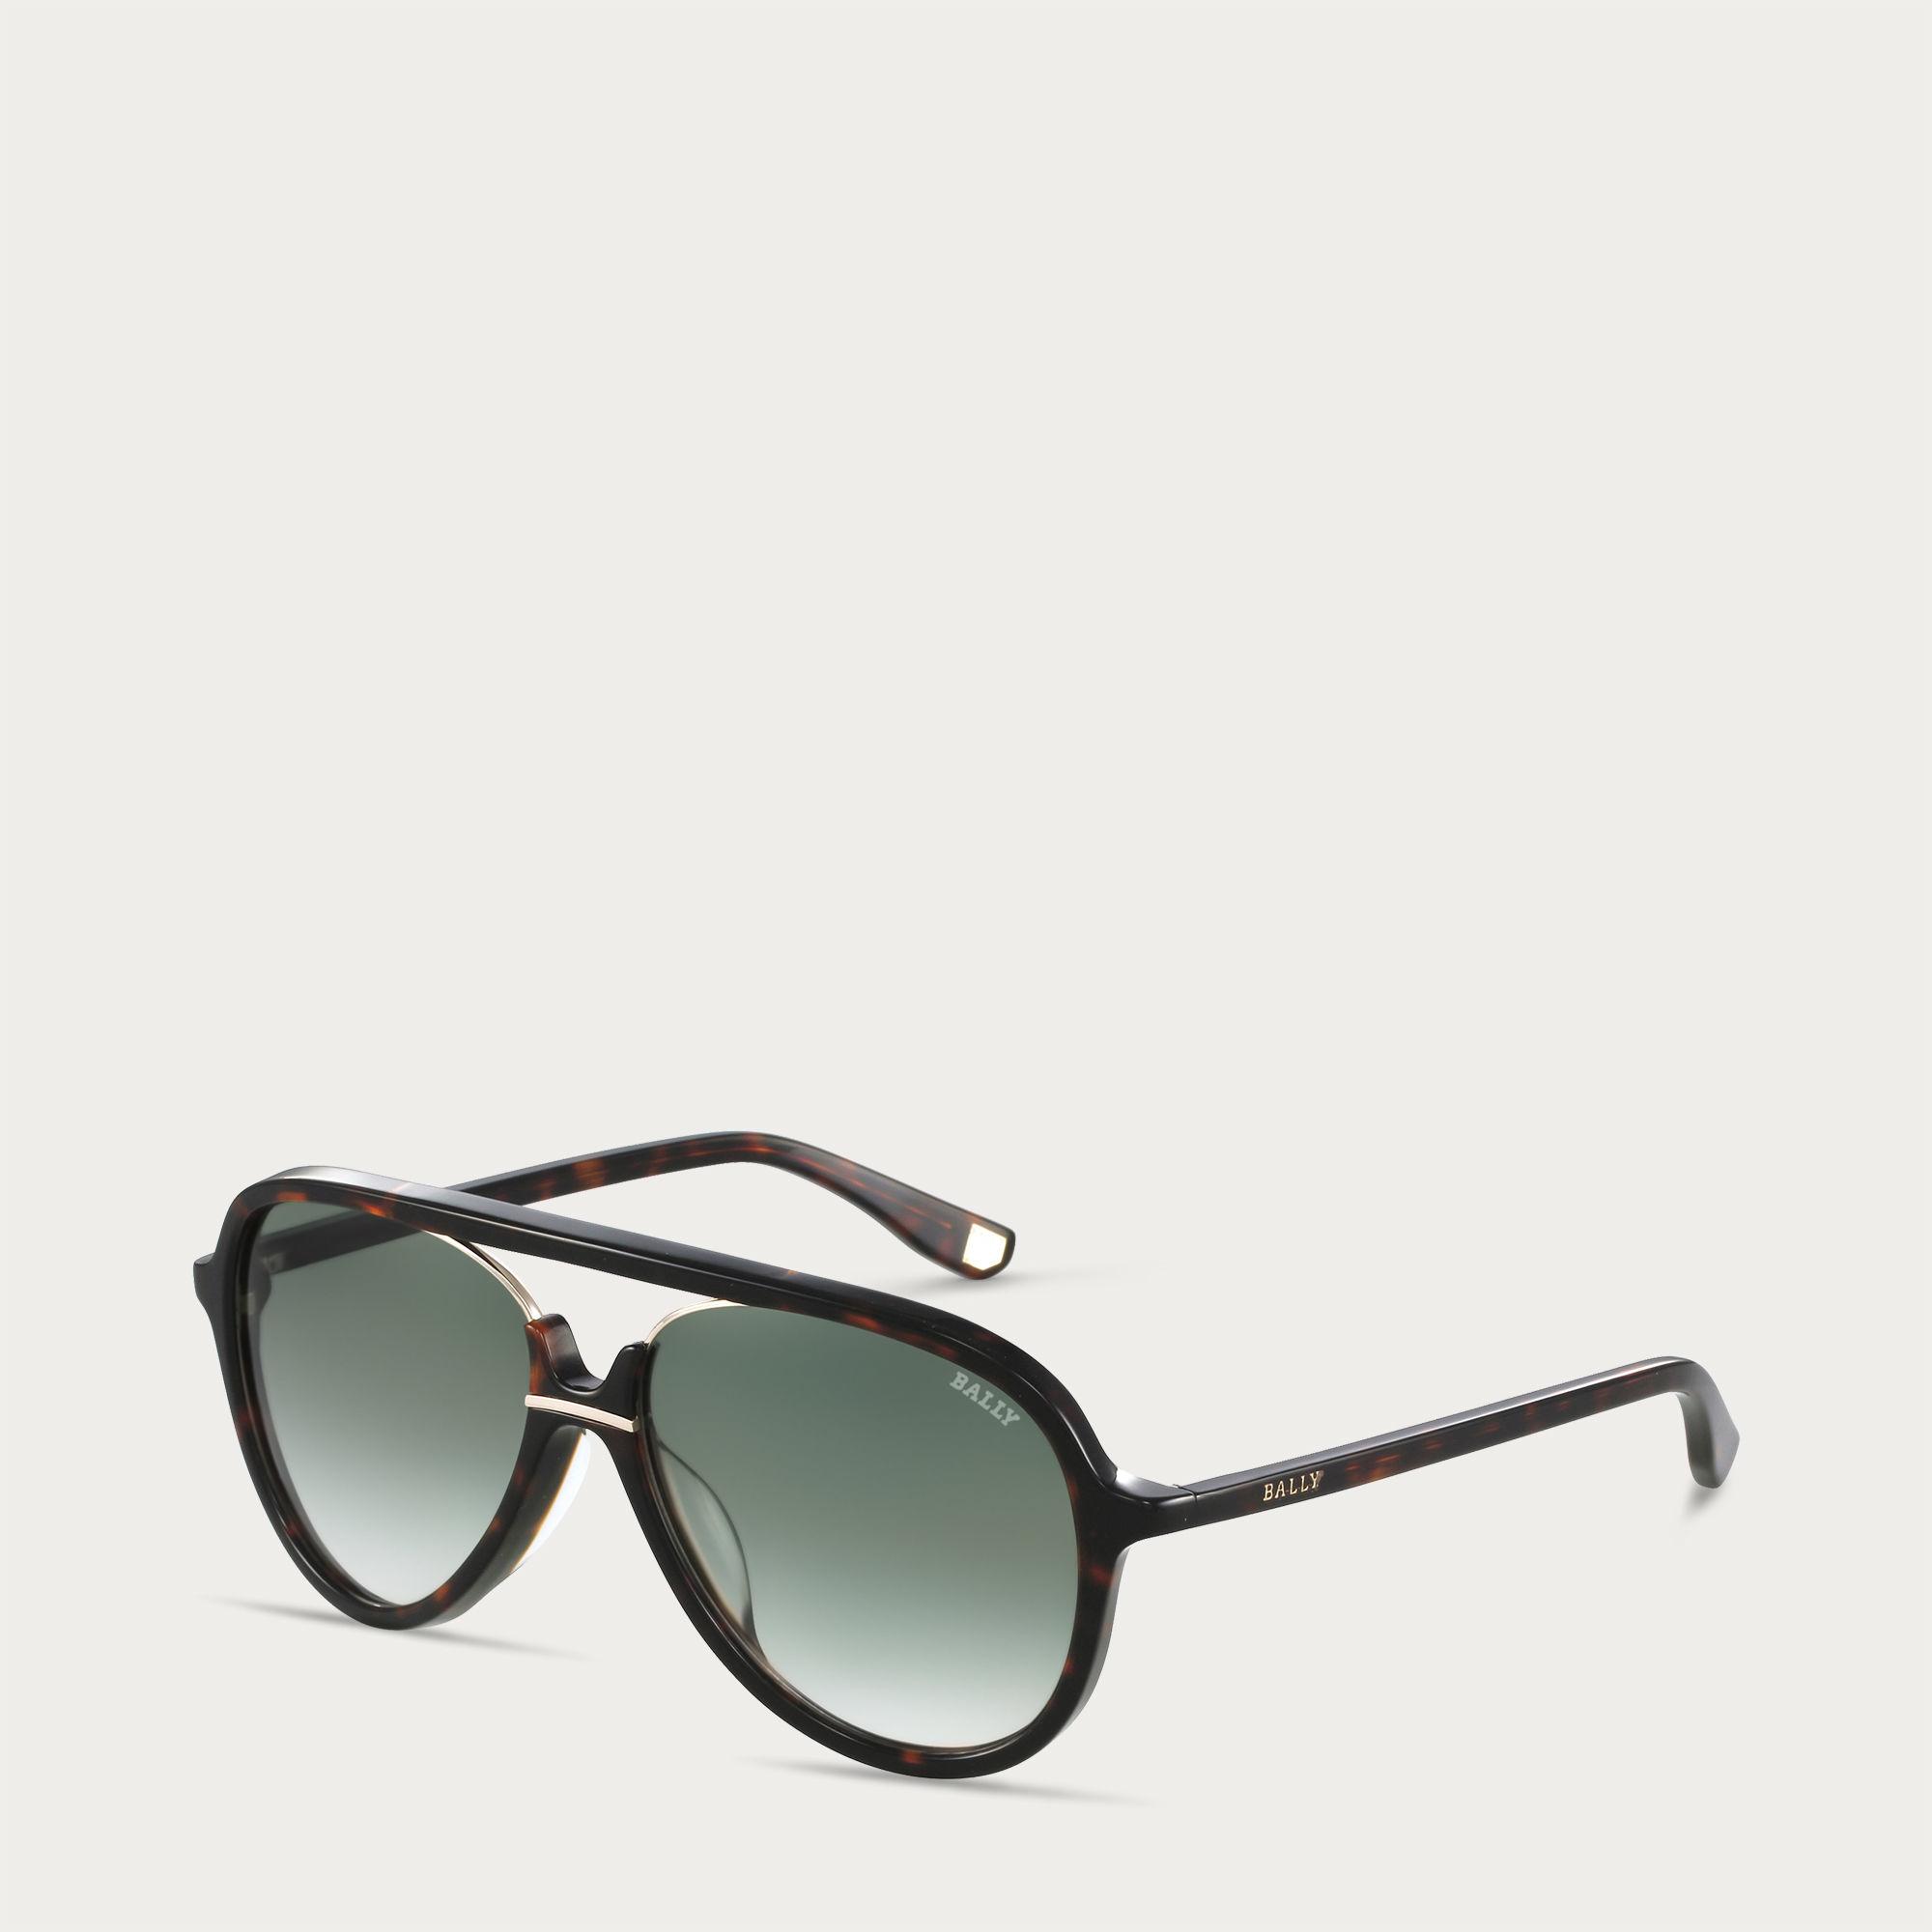 06837293e9 Bally Aviator Sunglasses Men's Thick Frame Aviator Sunglasses In ...